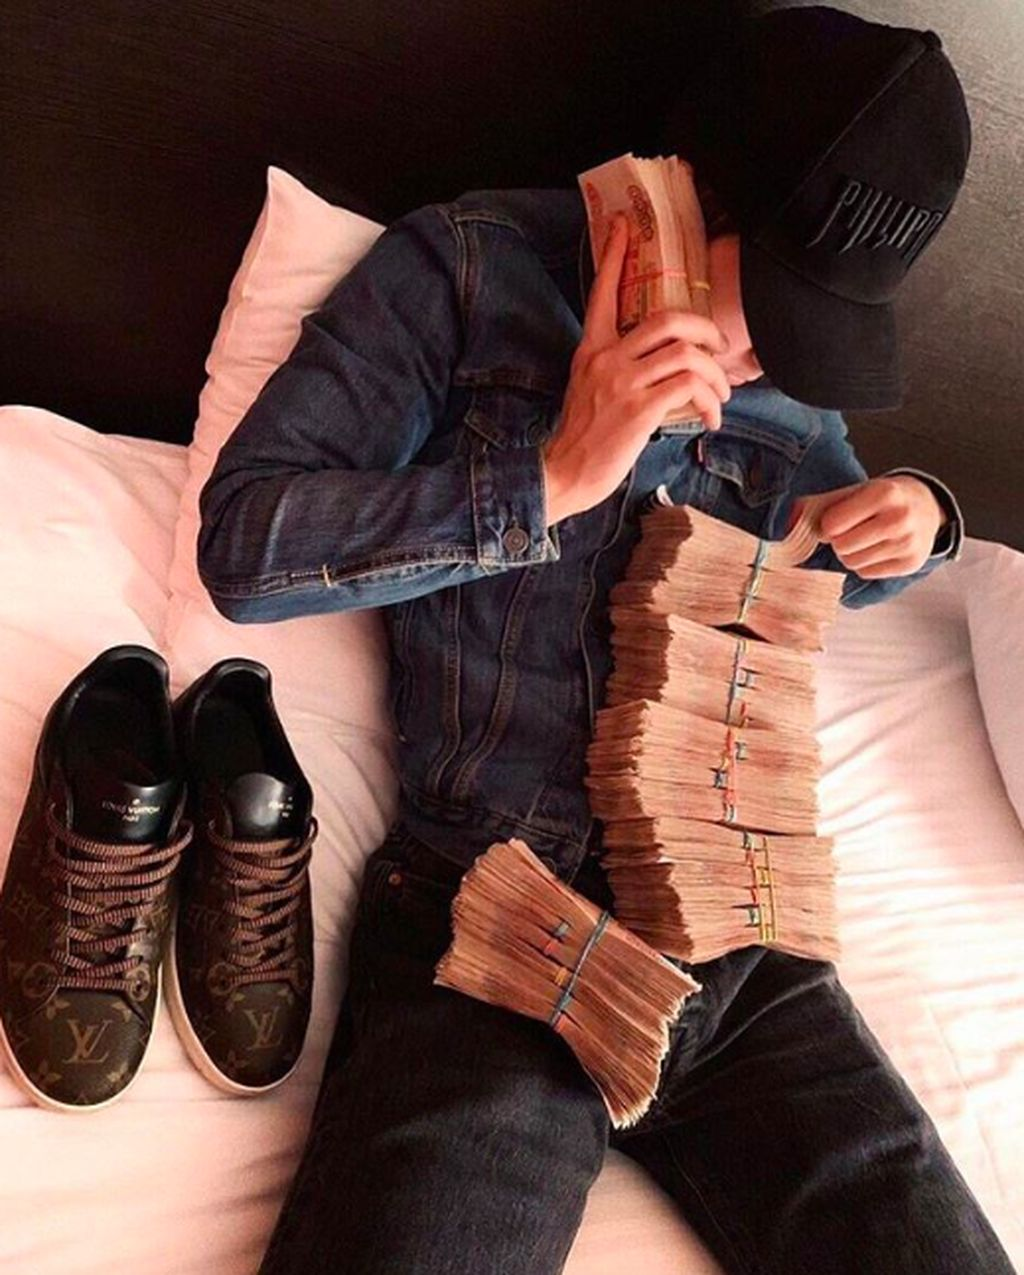 Akun Instagram bernama richrussiankids telah meraup lebih dari 1,3 juta follower. Berisi kumpulan anak muda Rusia pamer kekayaan seperti terlihat dalam foto ini. Foto: Instagram